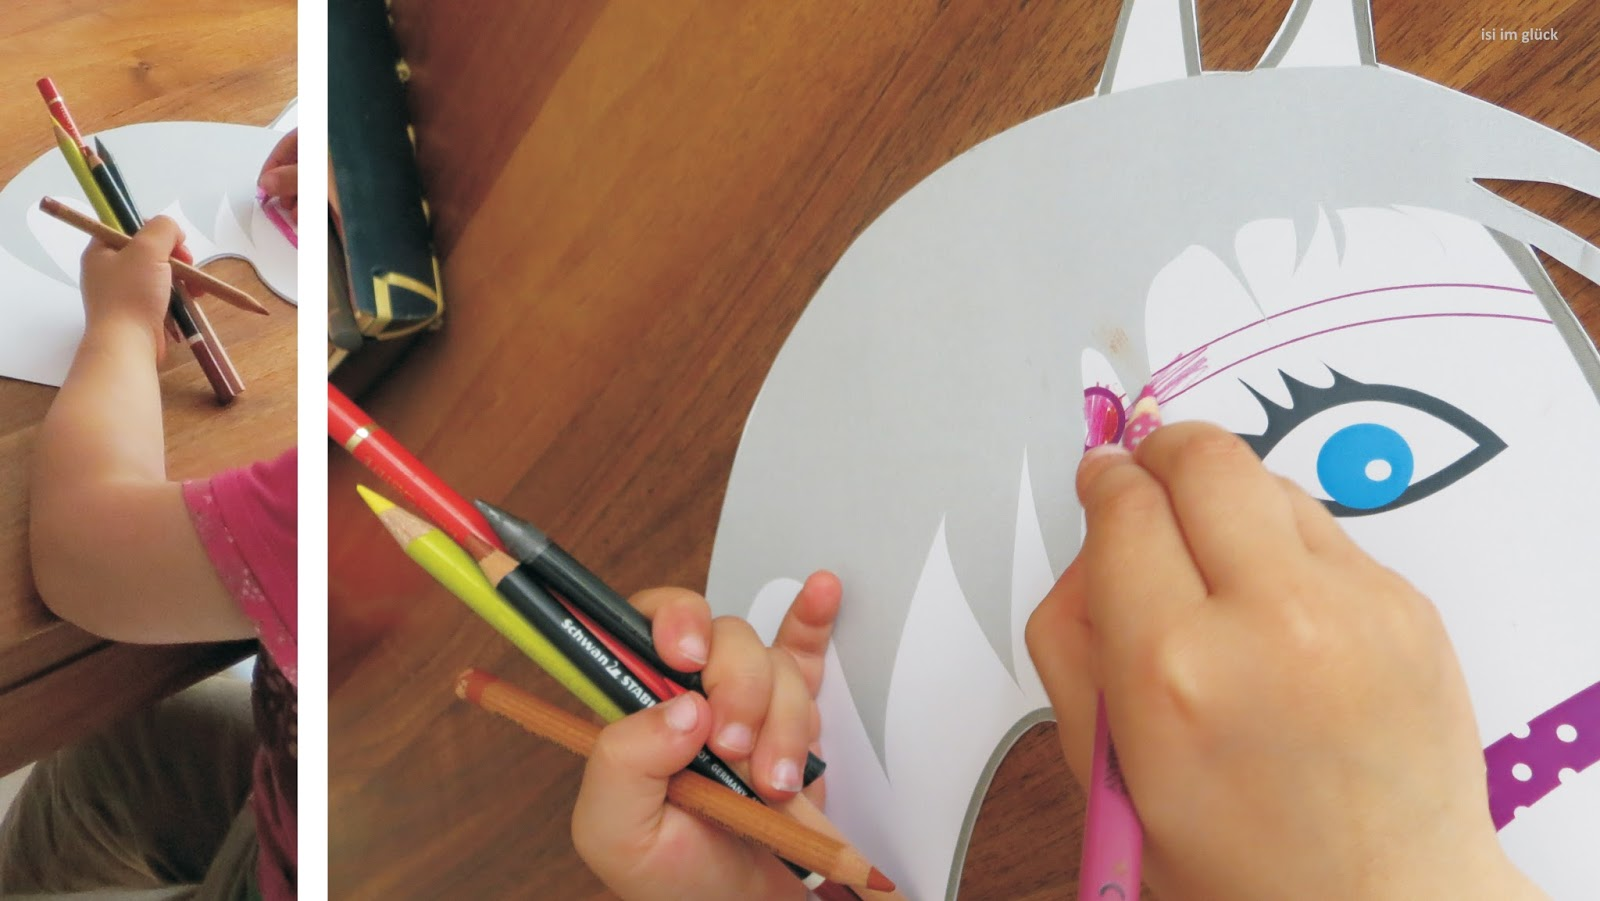 isi im glück: kindergeburtstag – pferdeparty / pferdegeburtstag, Einladung